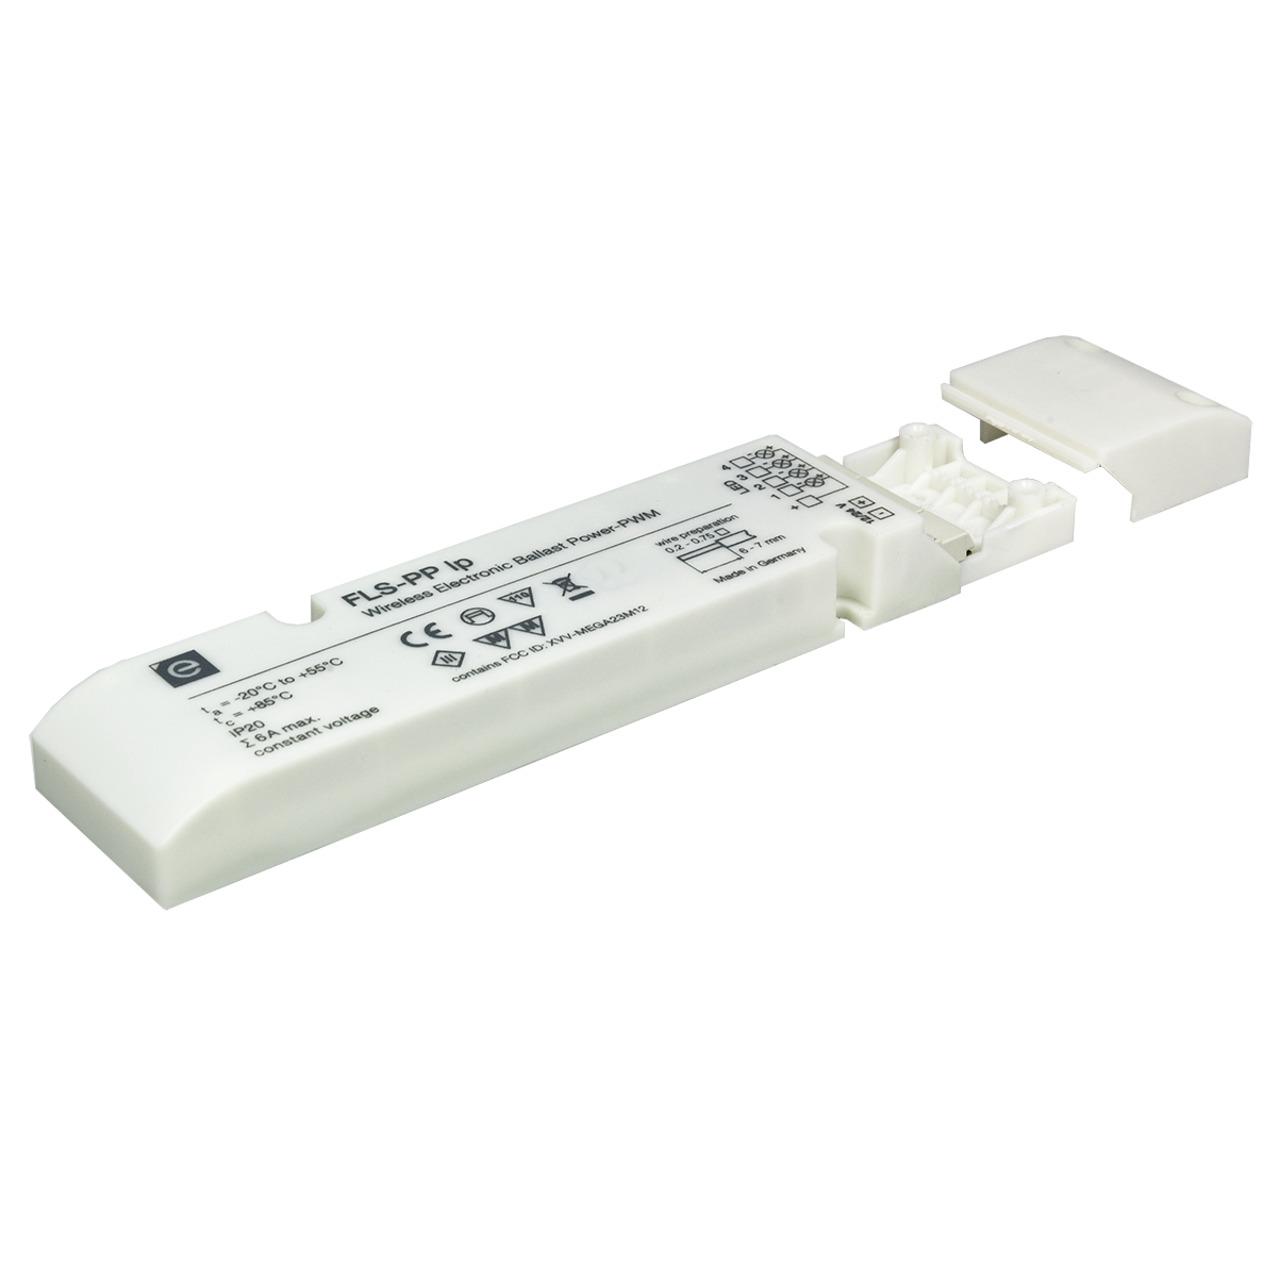 Dresden Elektronik Zigbee-Funk-Controller für LED-Streifen